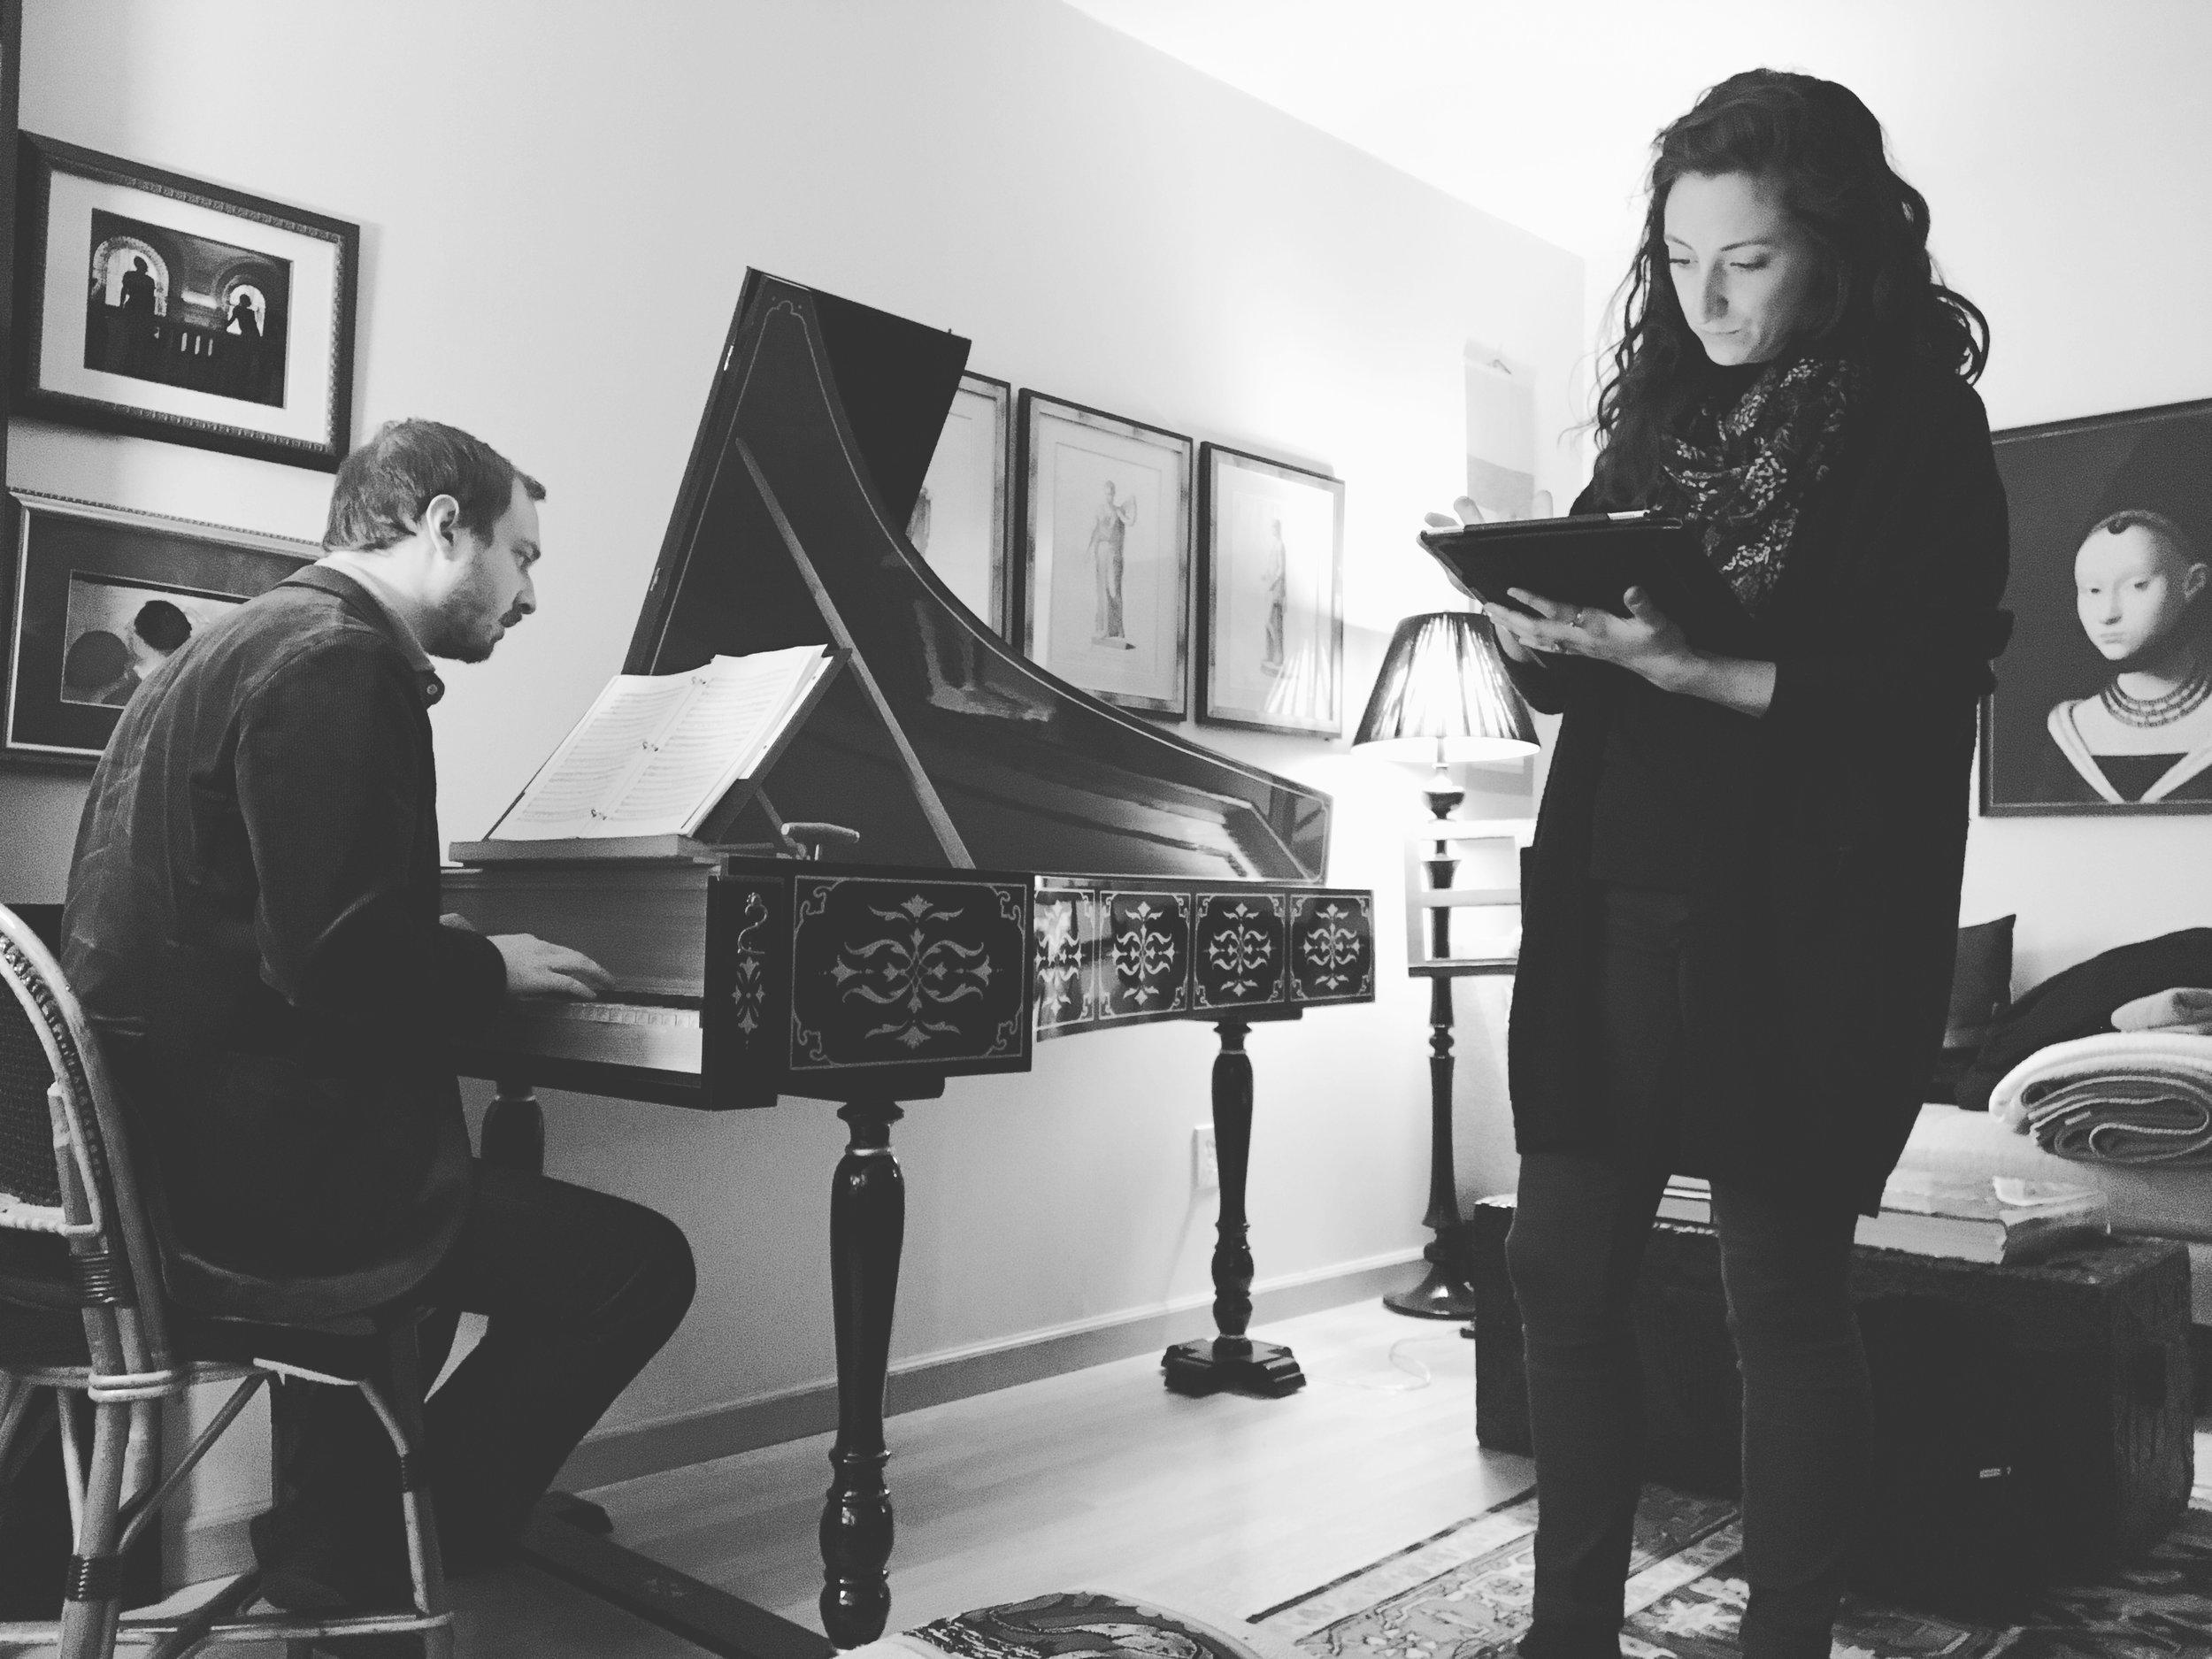 Heather rehearsing with harpsichordist Dylan Sauerwald. Photo credit: Joyce Yin